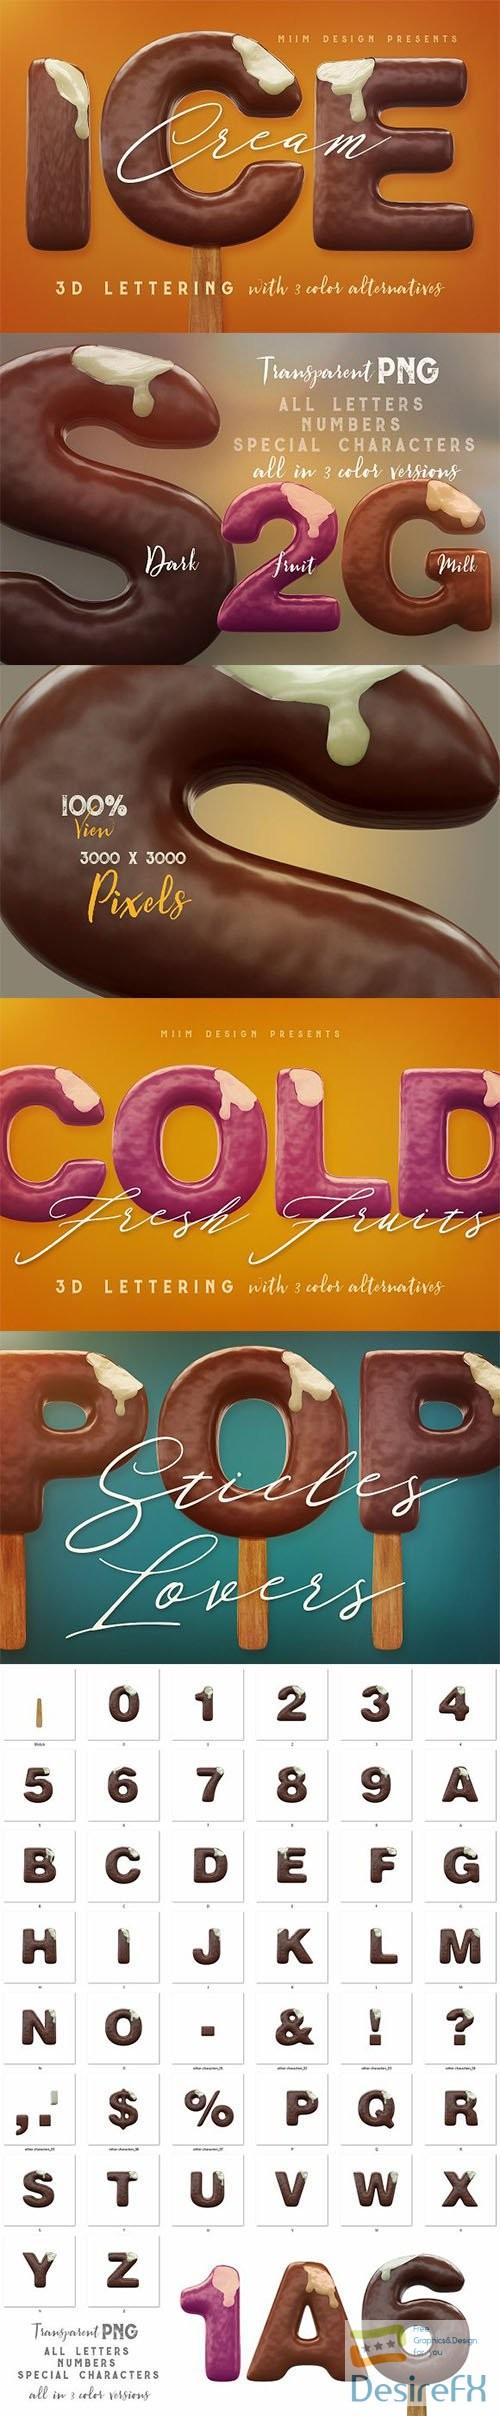 photoshop - Ice Cream - 3D Lettering 2749746